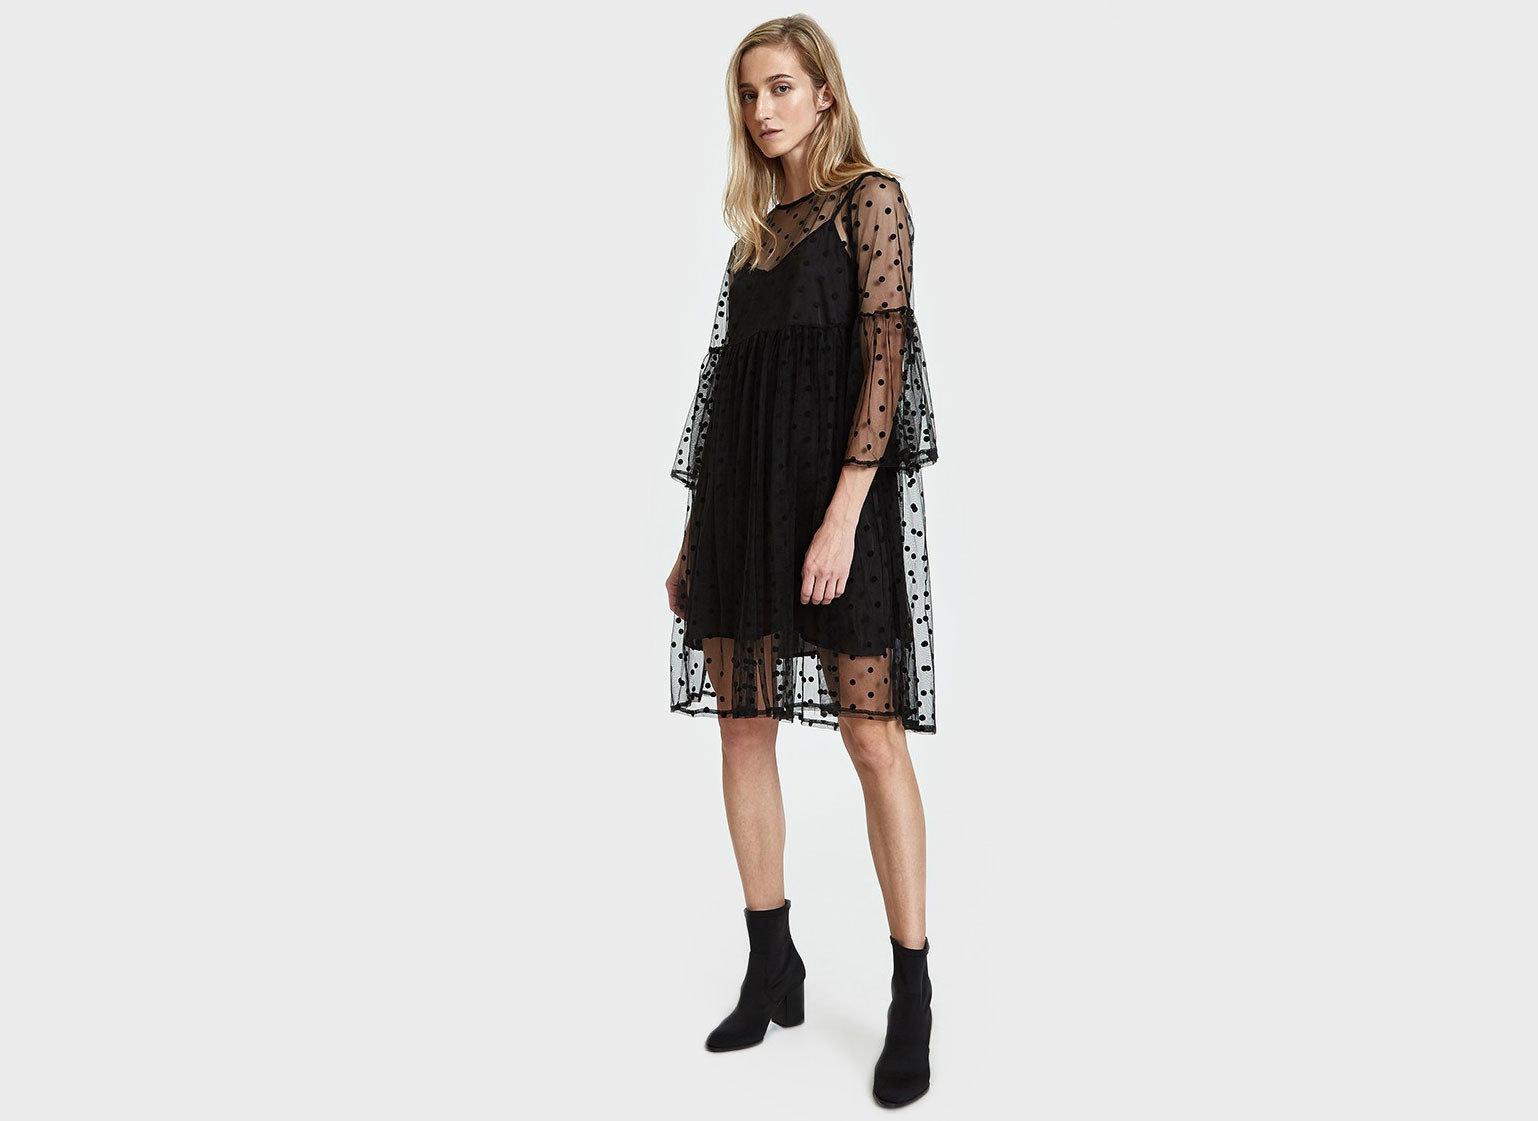 Travel Shop Travel Trends clothing fashion model shoulder outerwear costume neck little black dress